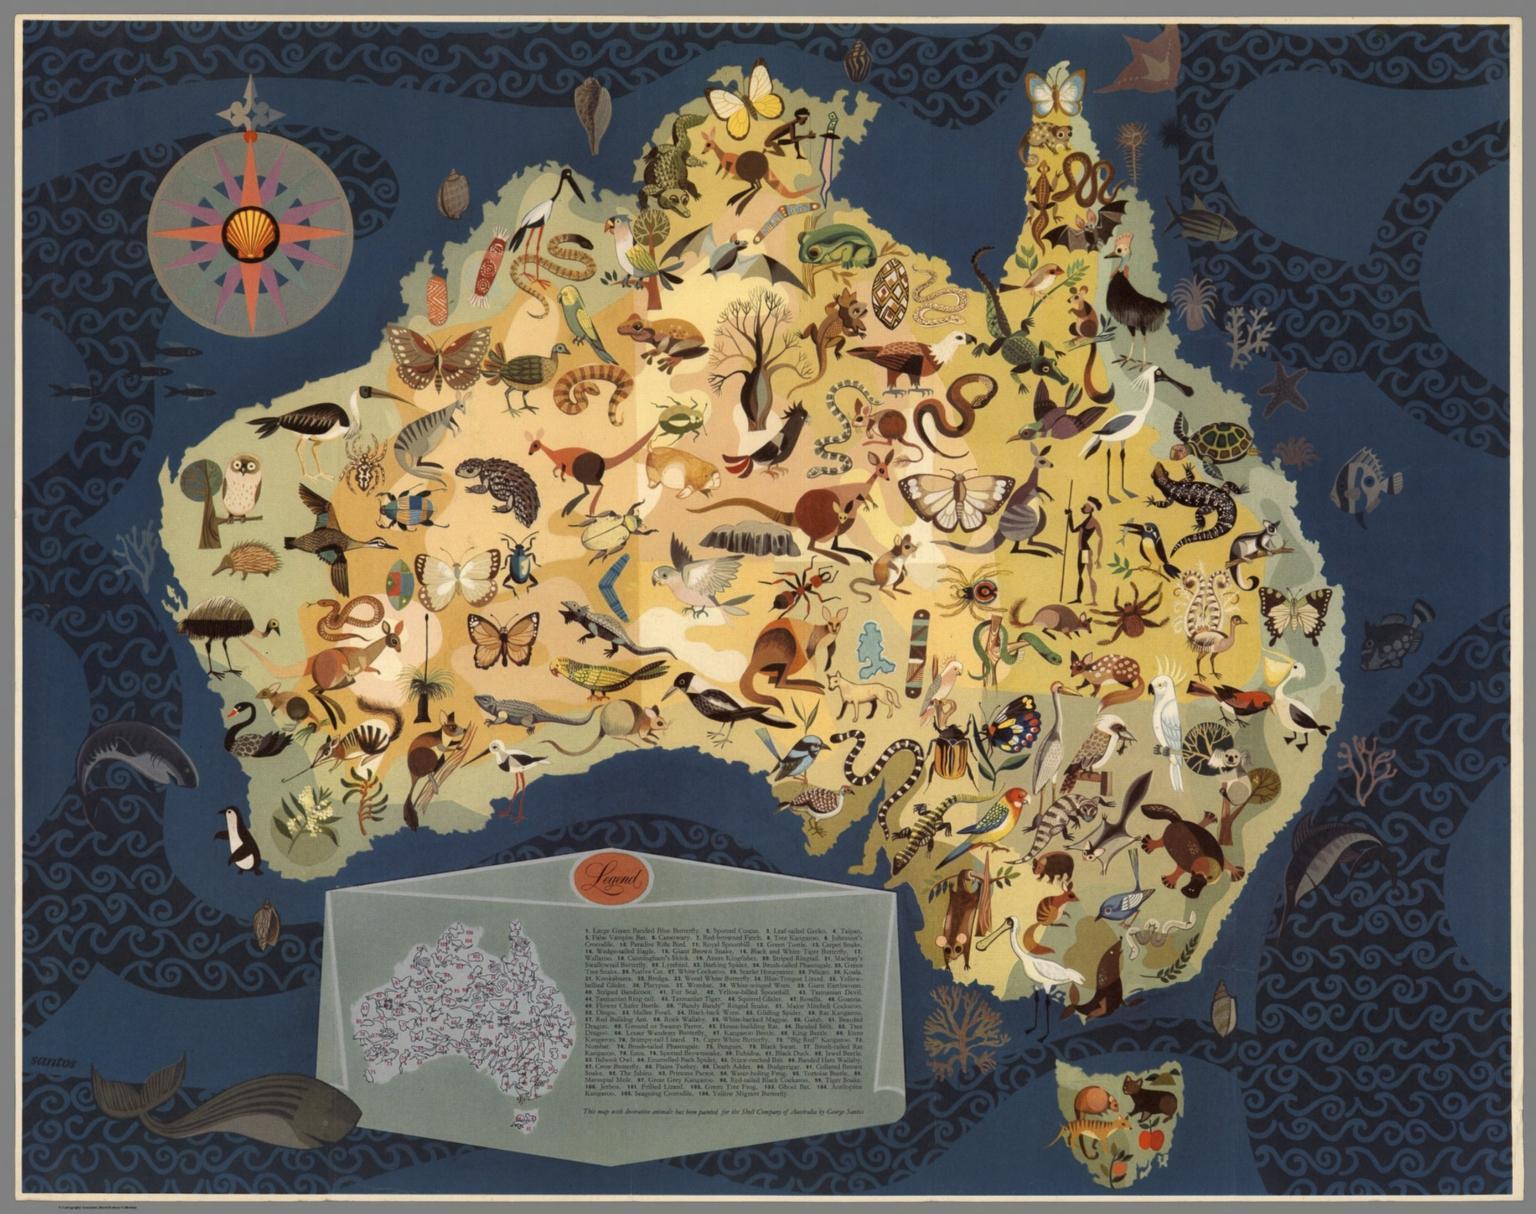 Australia - Decorative Animals by George Santos.